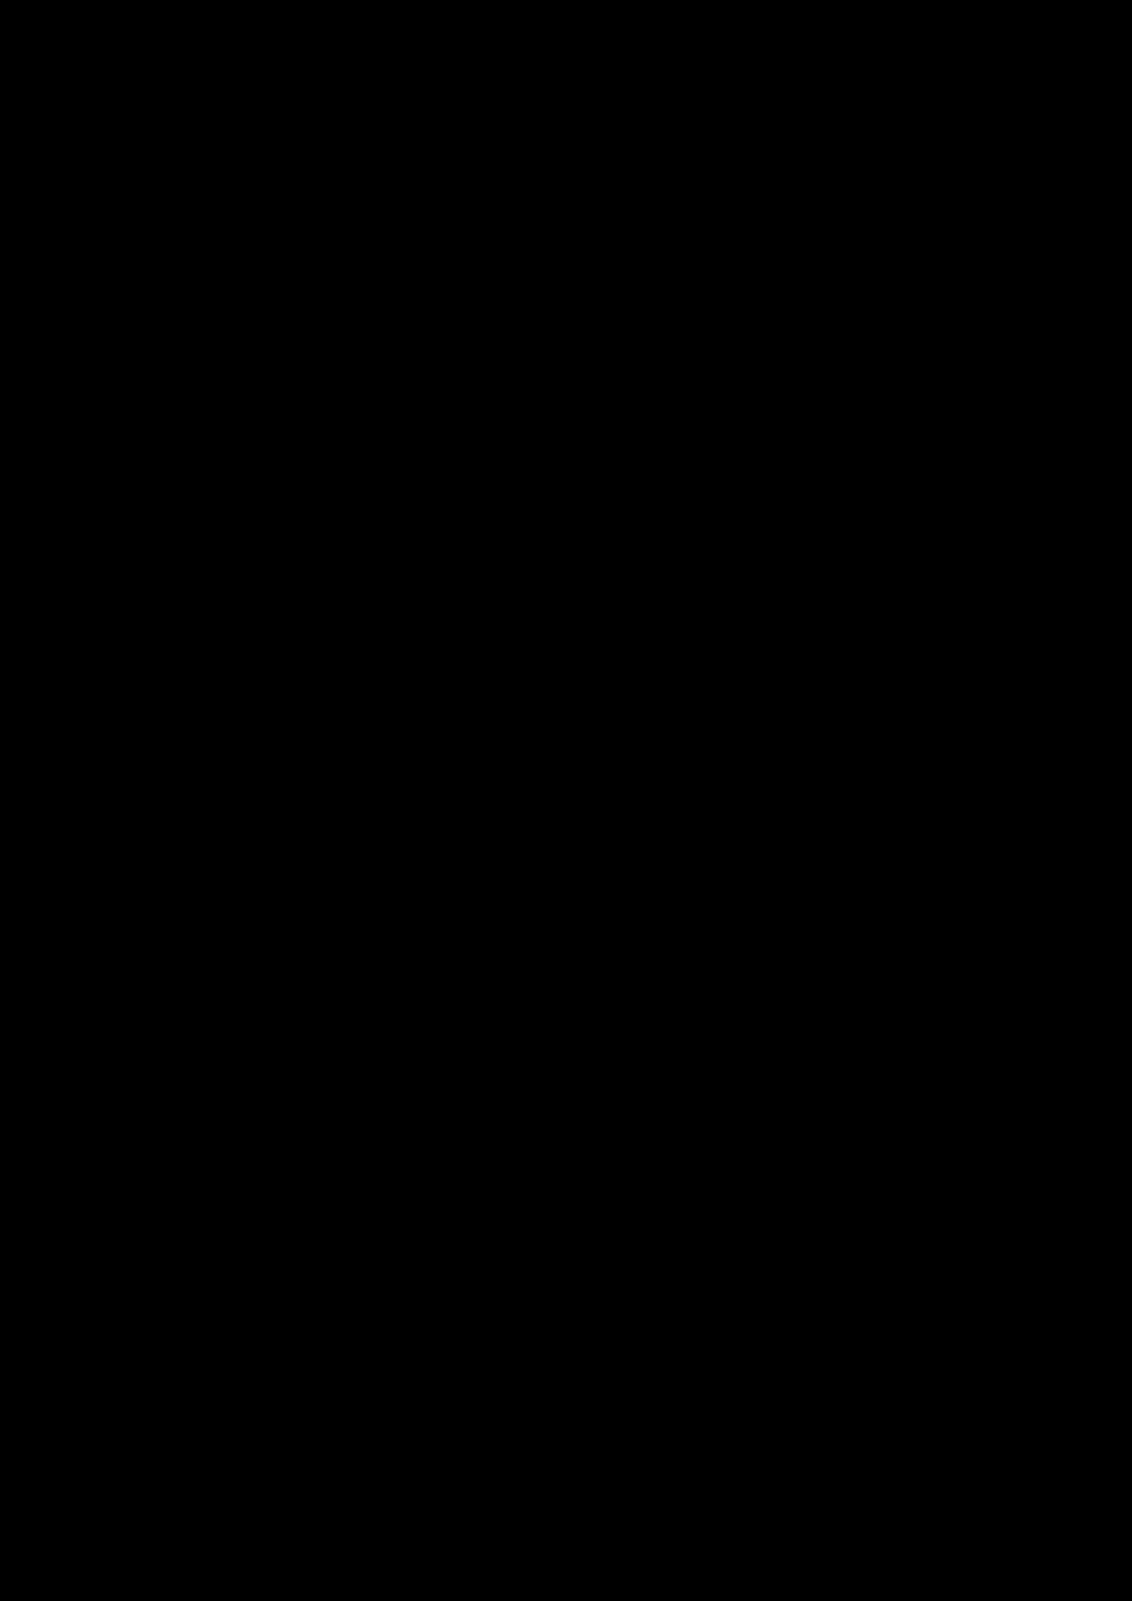 Belyiy sokol slide, Image 200